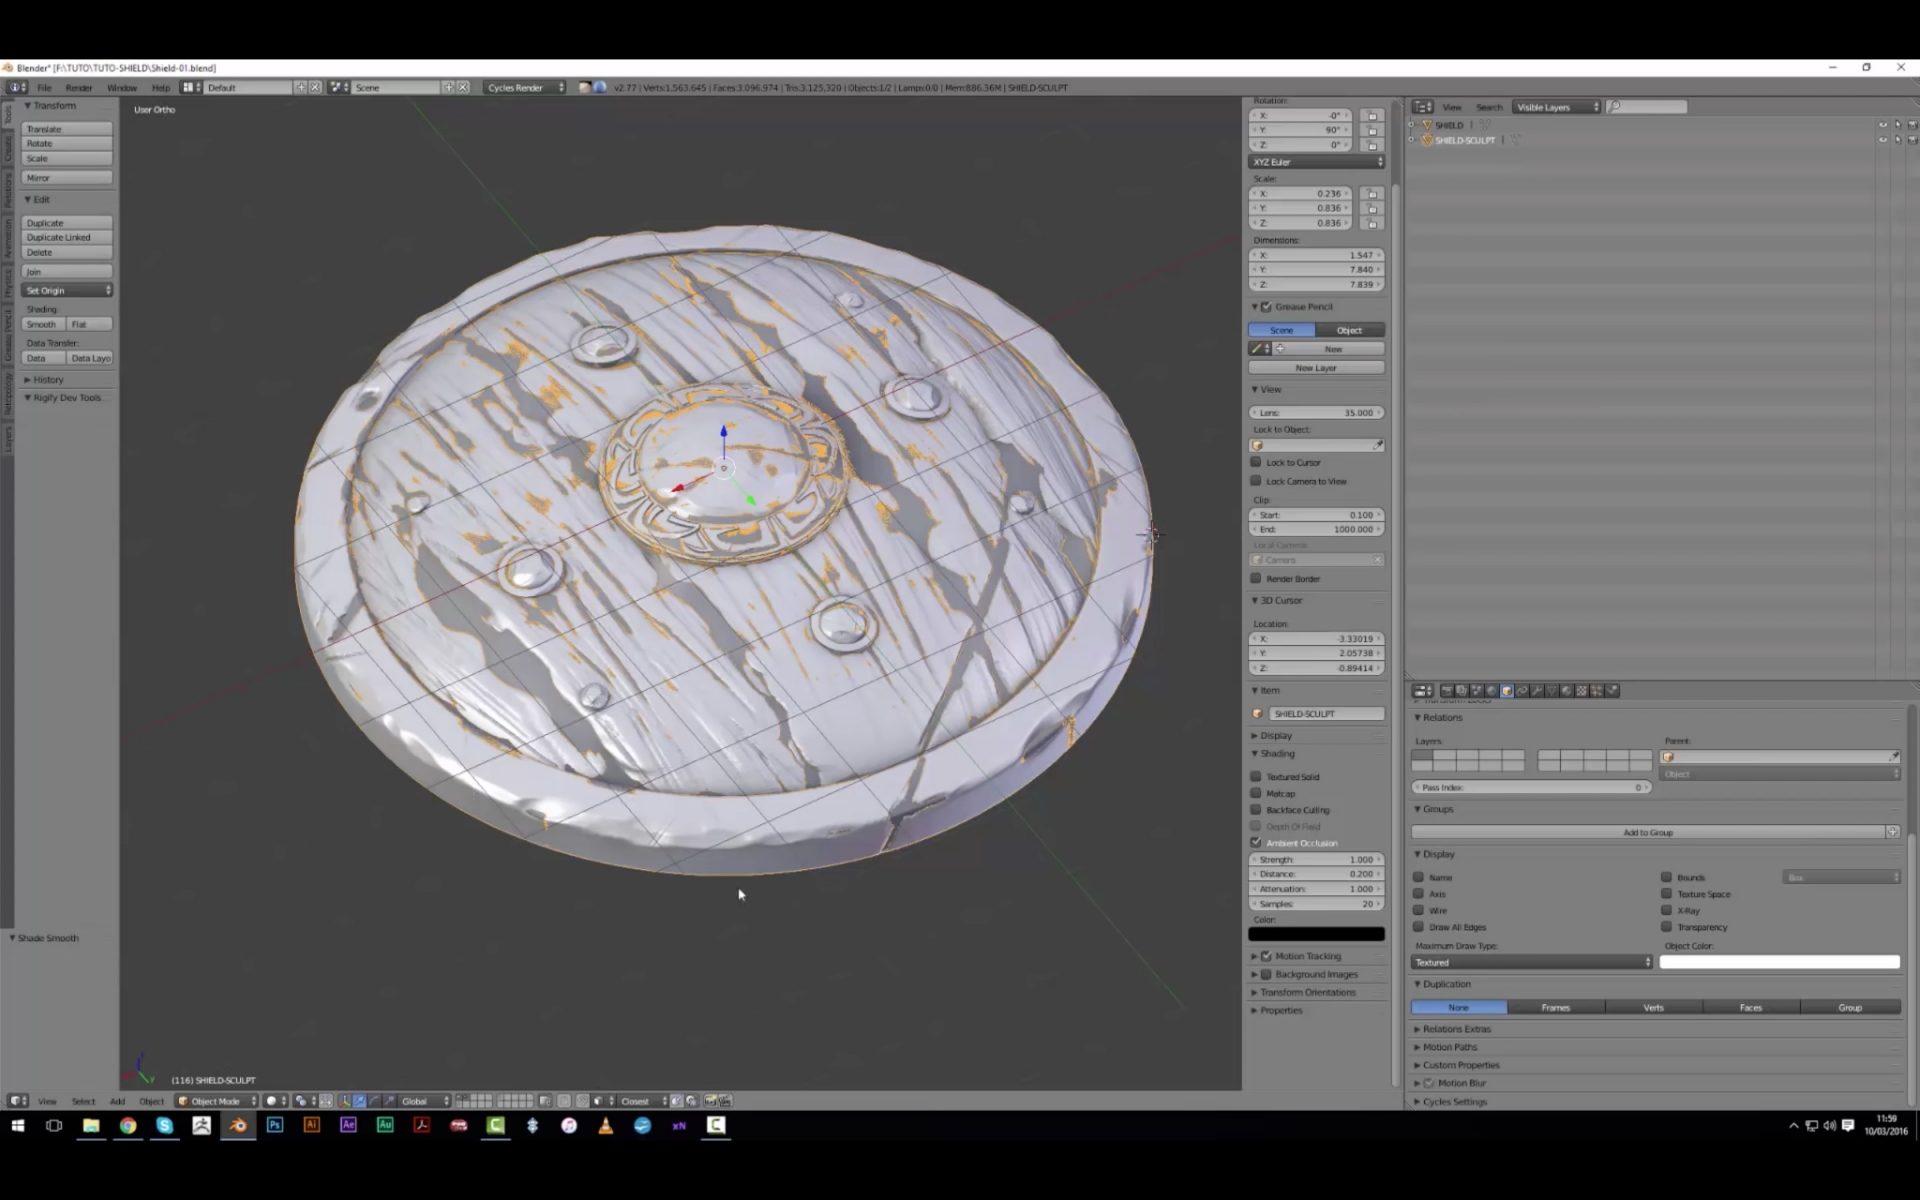 PBR Material Creation in Blender